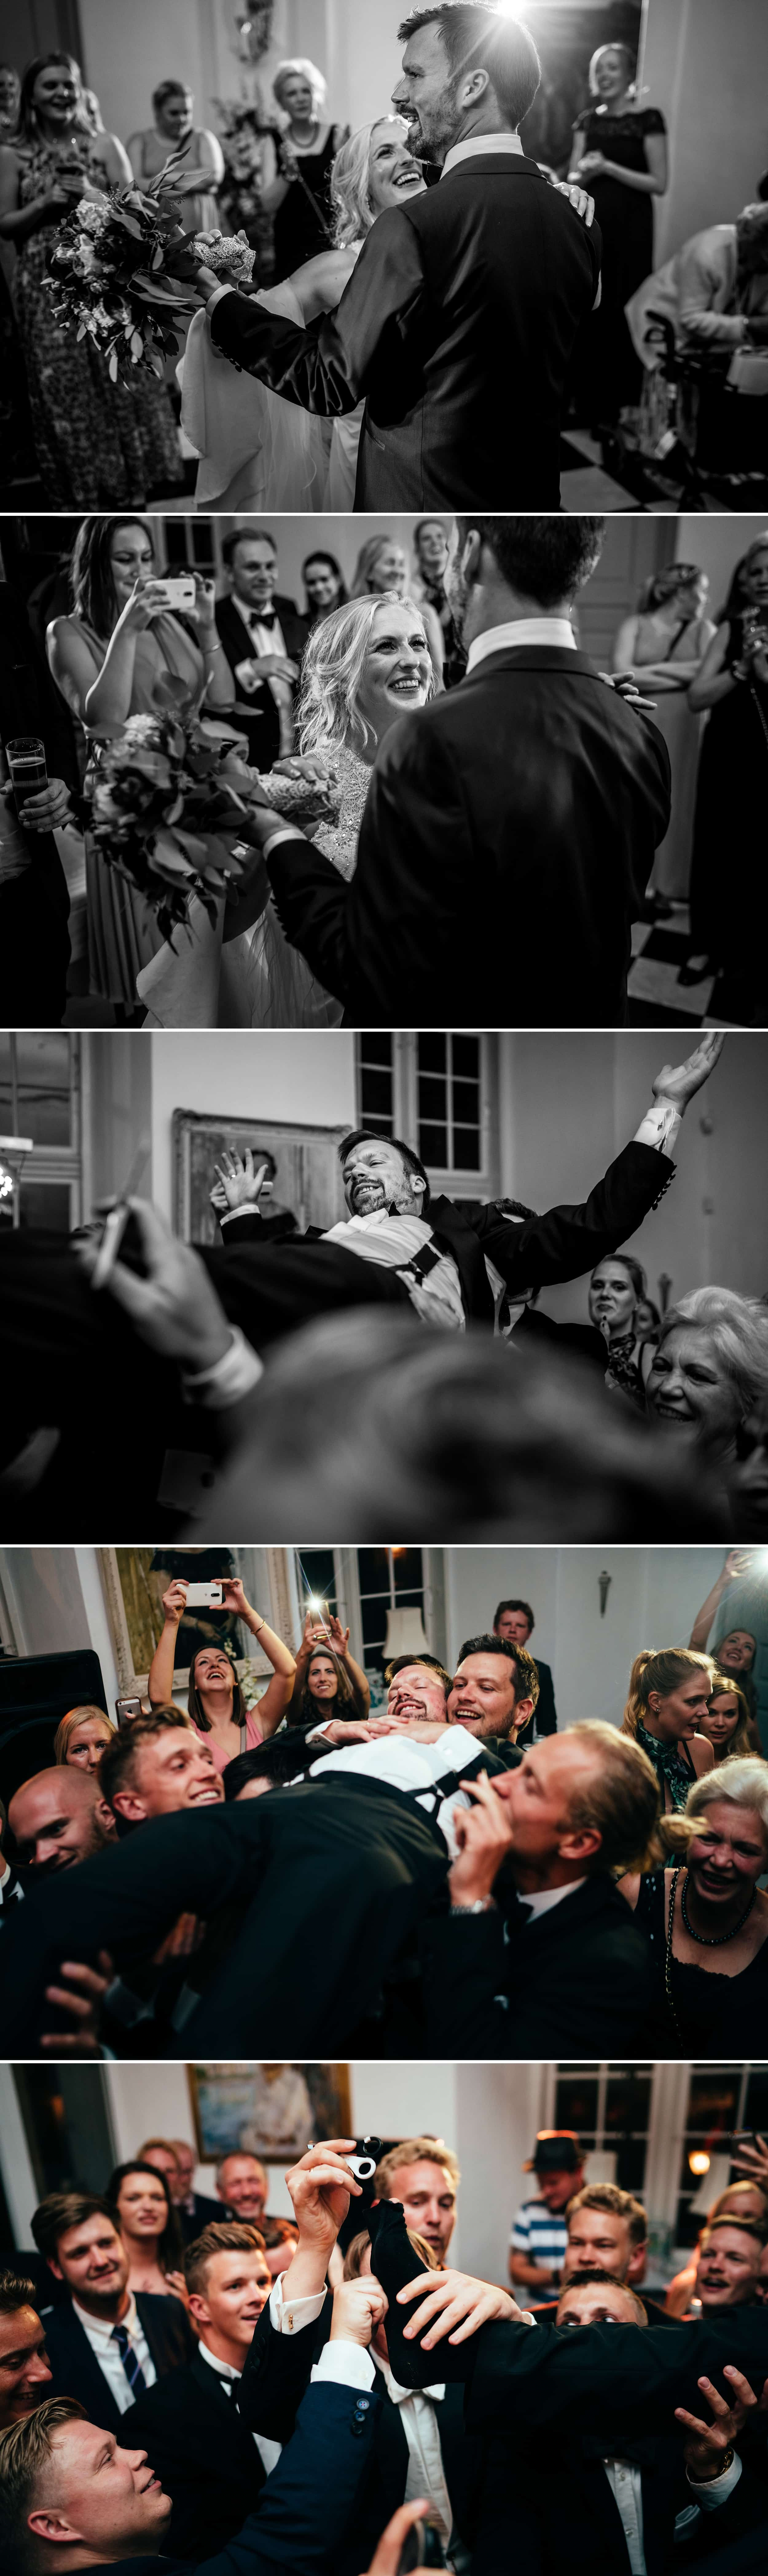 brudevals-bryllupsfotograf-fyn.jpg